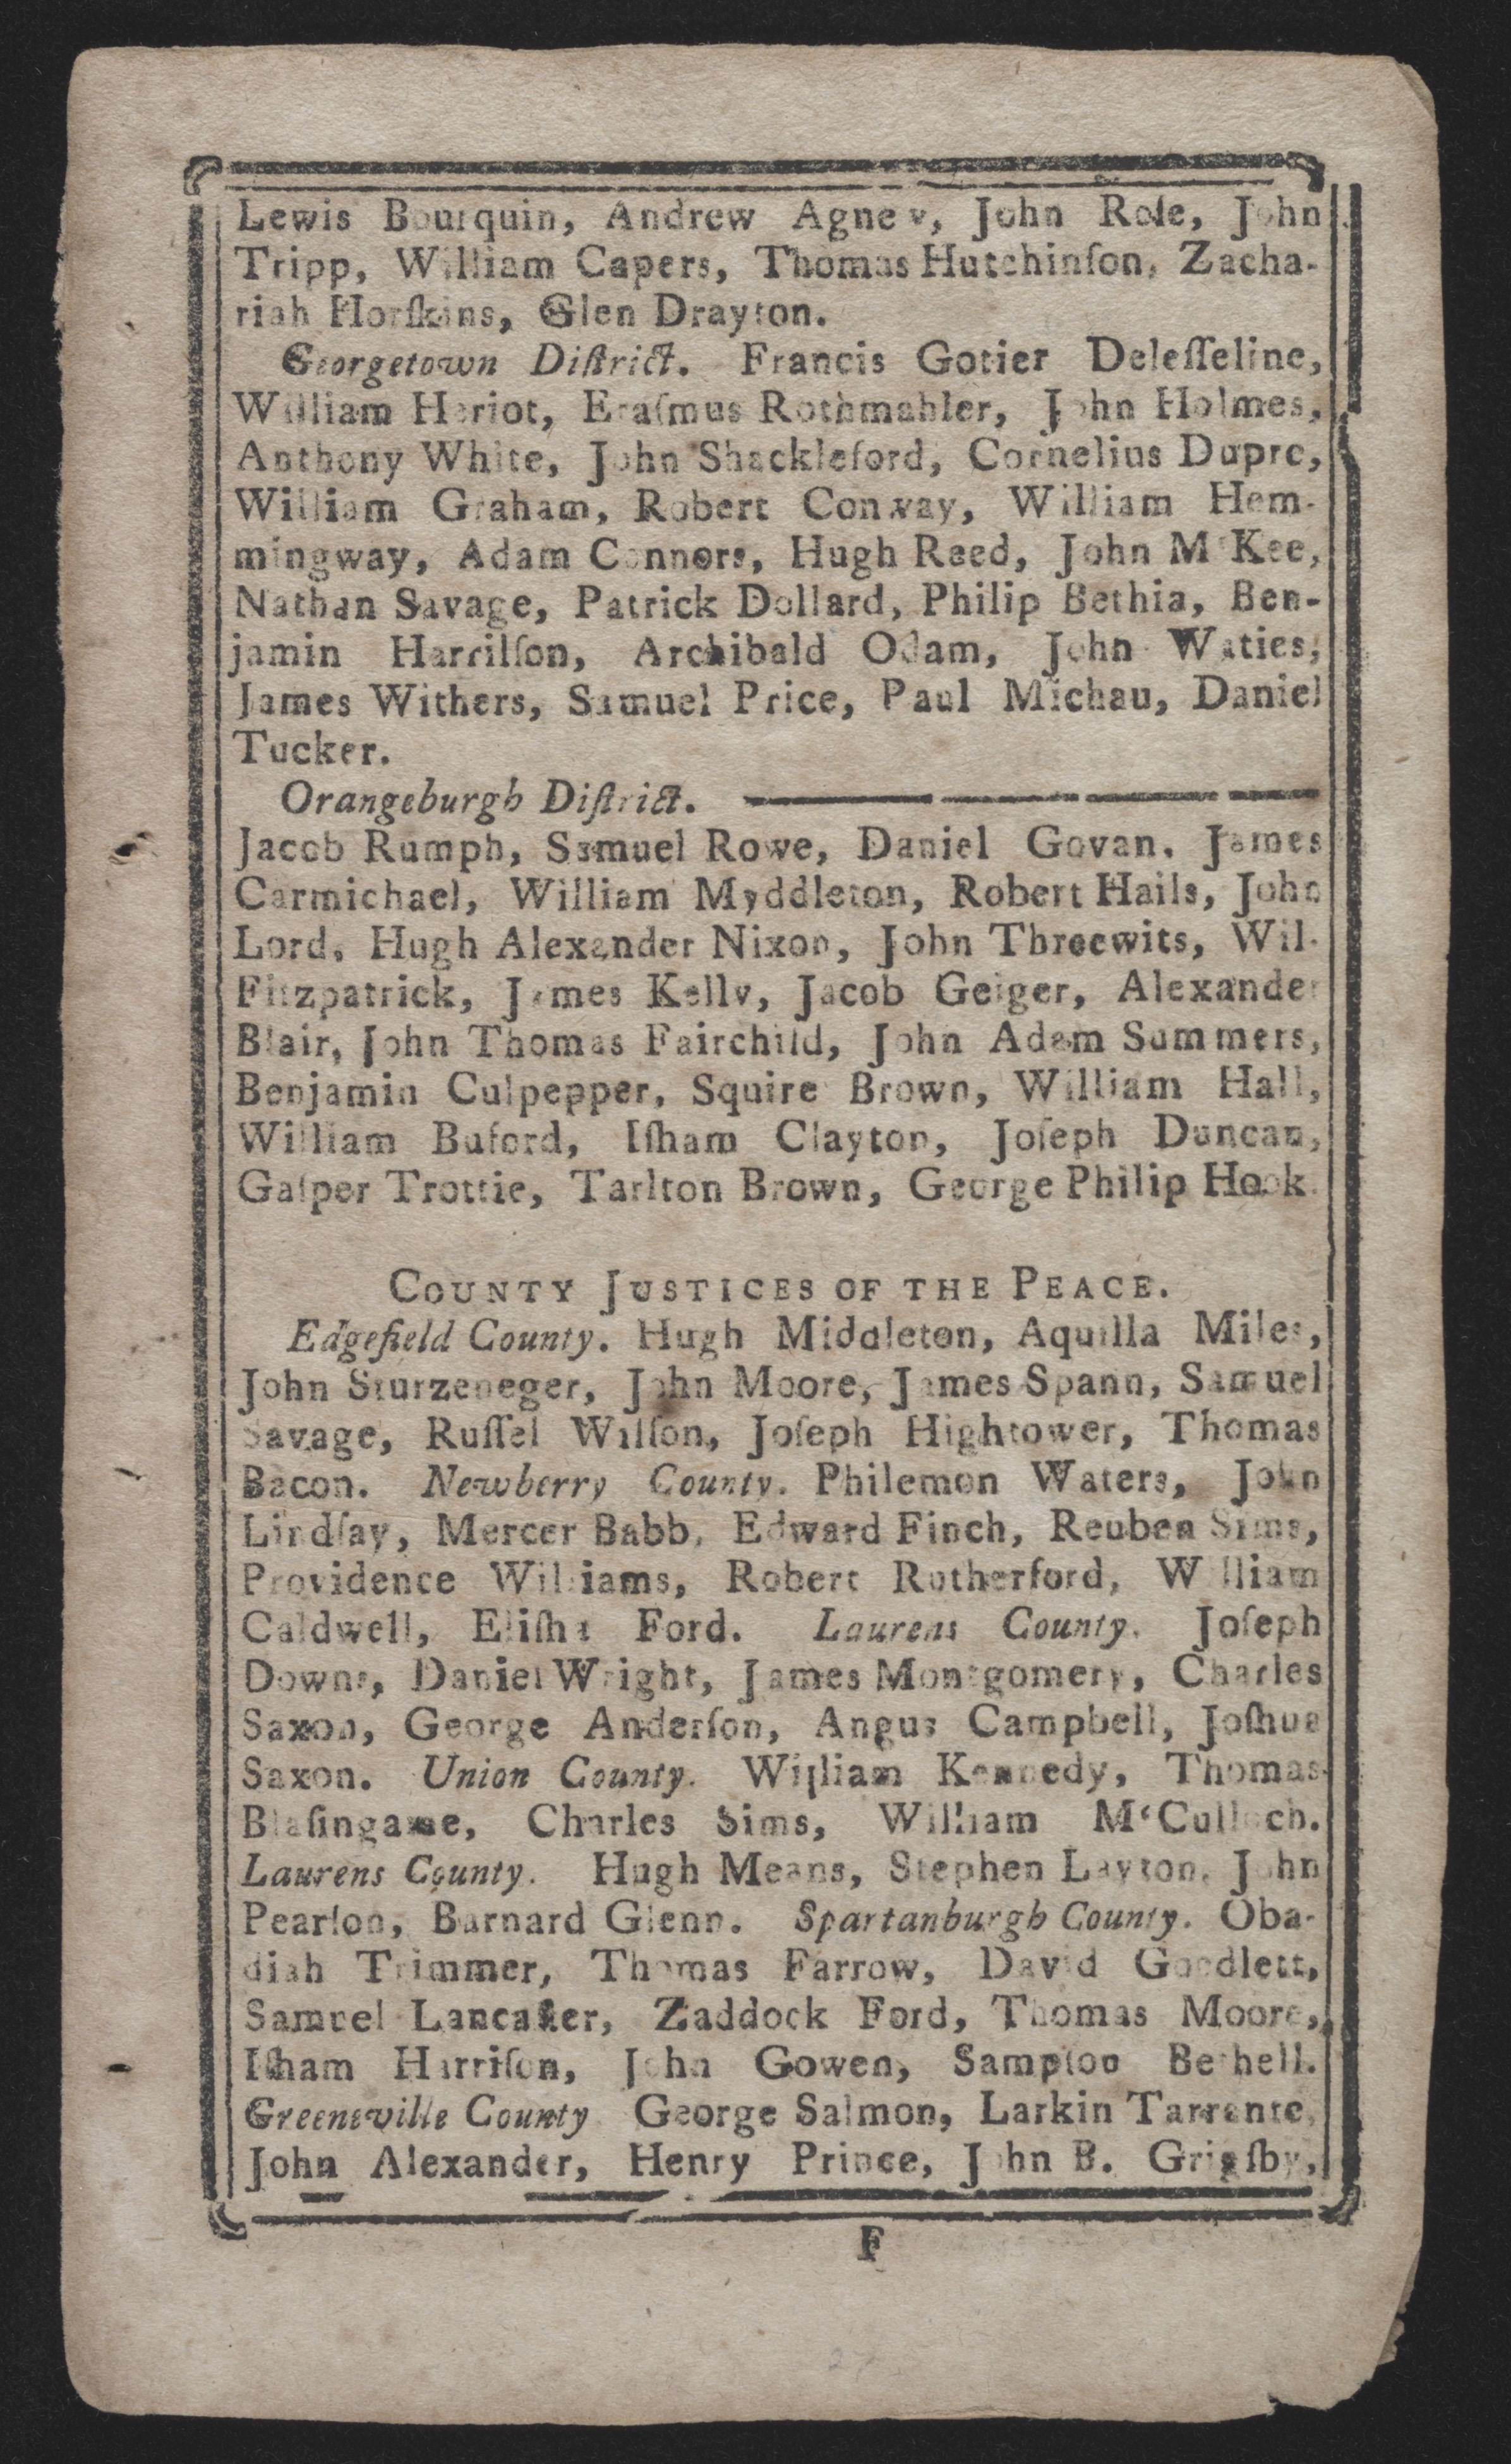 Sandy Island Plantation Journal, Volume 1, 1792, Page 52